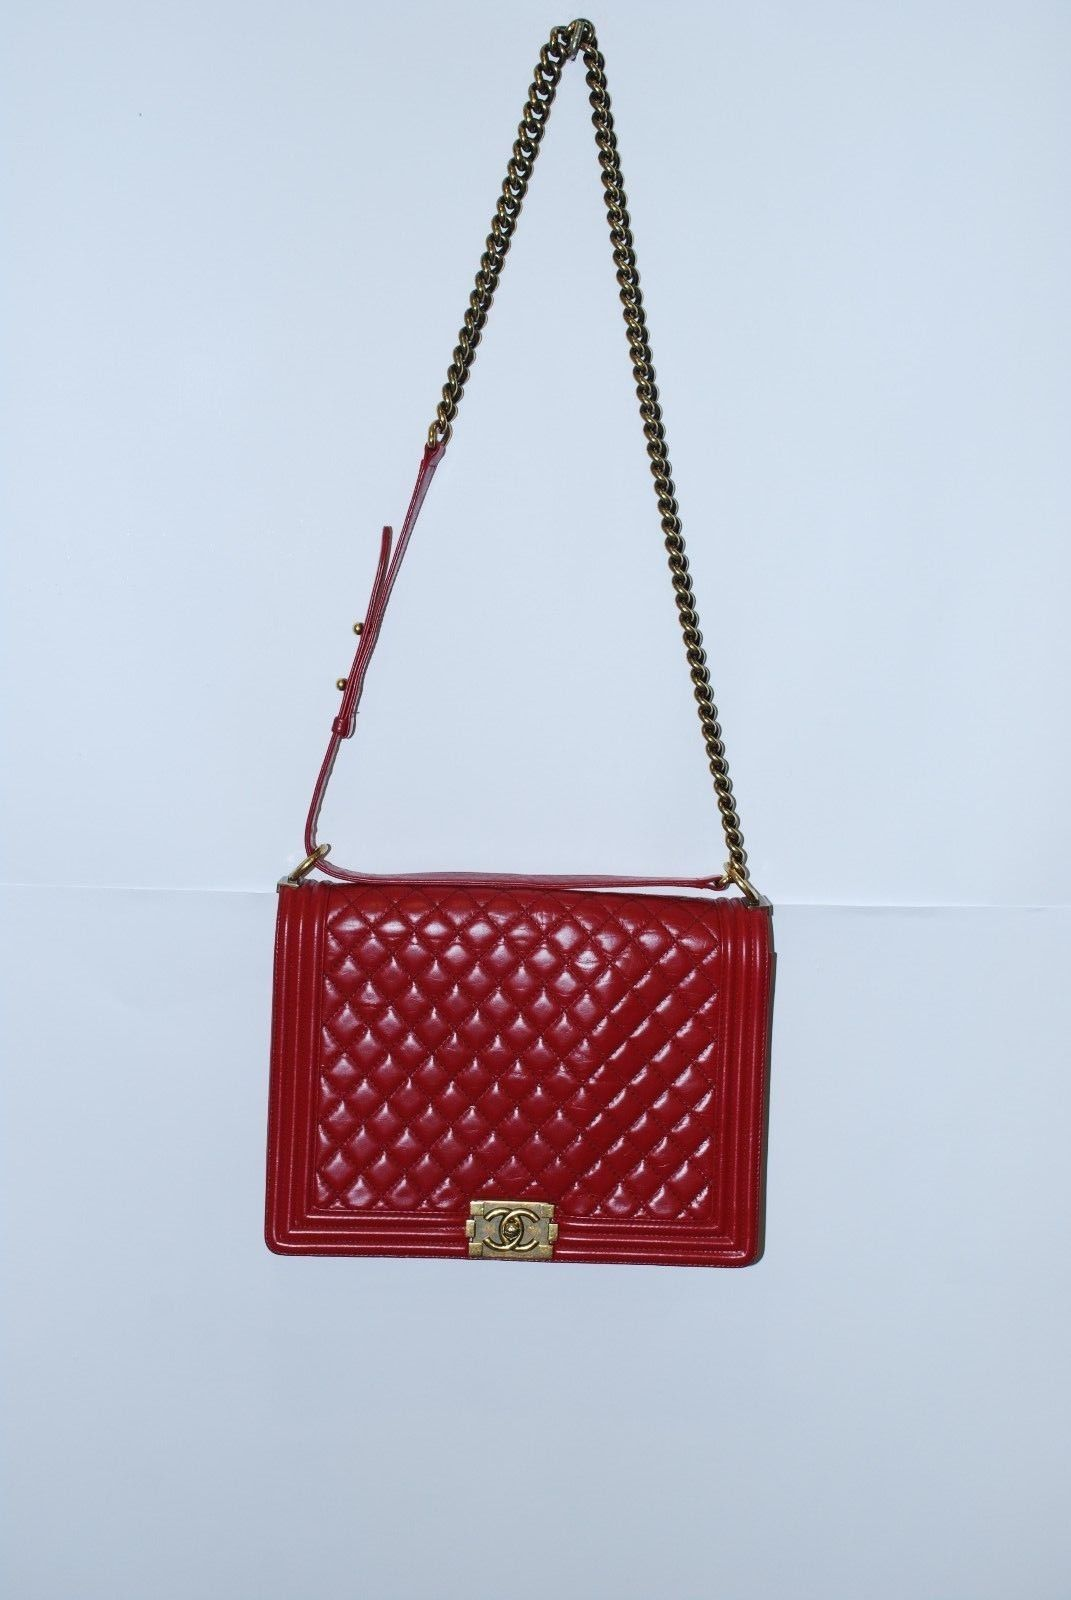 e311509d5e57 CHANEL Boy Red CC Quilted Leather Handbag Chain Messenger Shoulder Bag Large